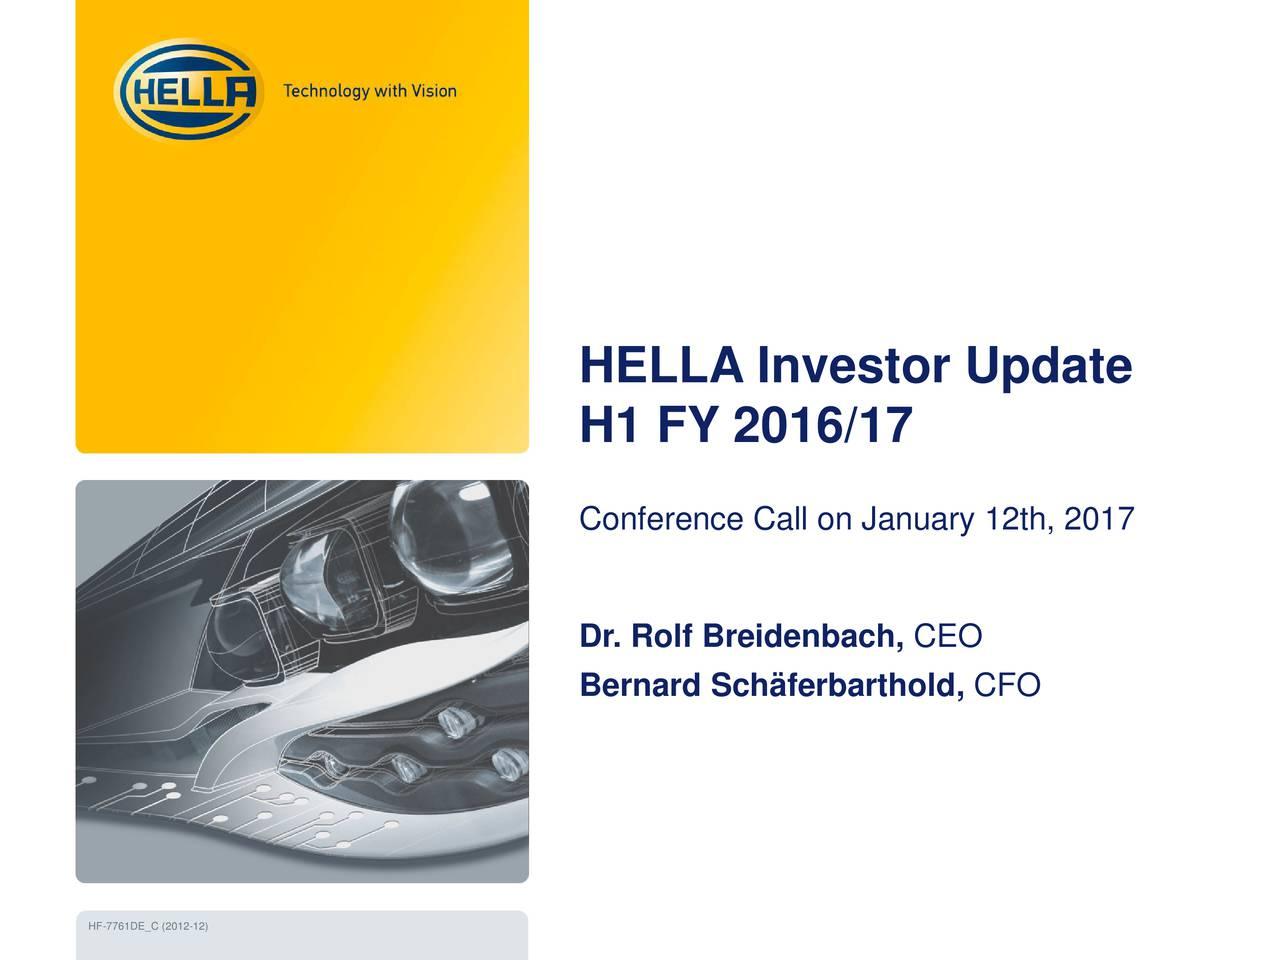 H1 FY 2016/17 Conference Call on January 12th, 2017 Dr. Rolf Breidenbach, CEO Bernard Schferbarthold, CFO HF-7761DE_C (2012-12)